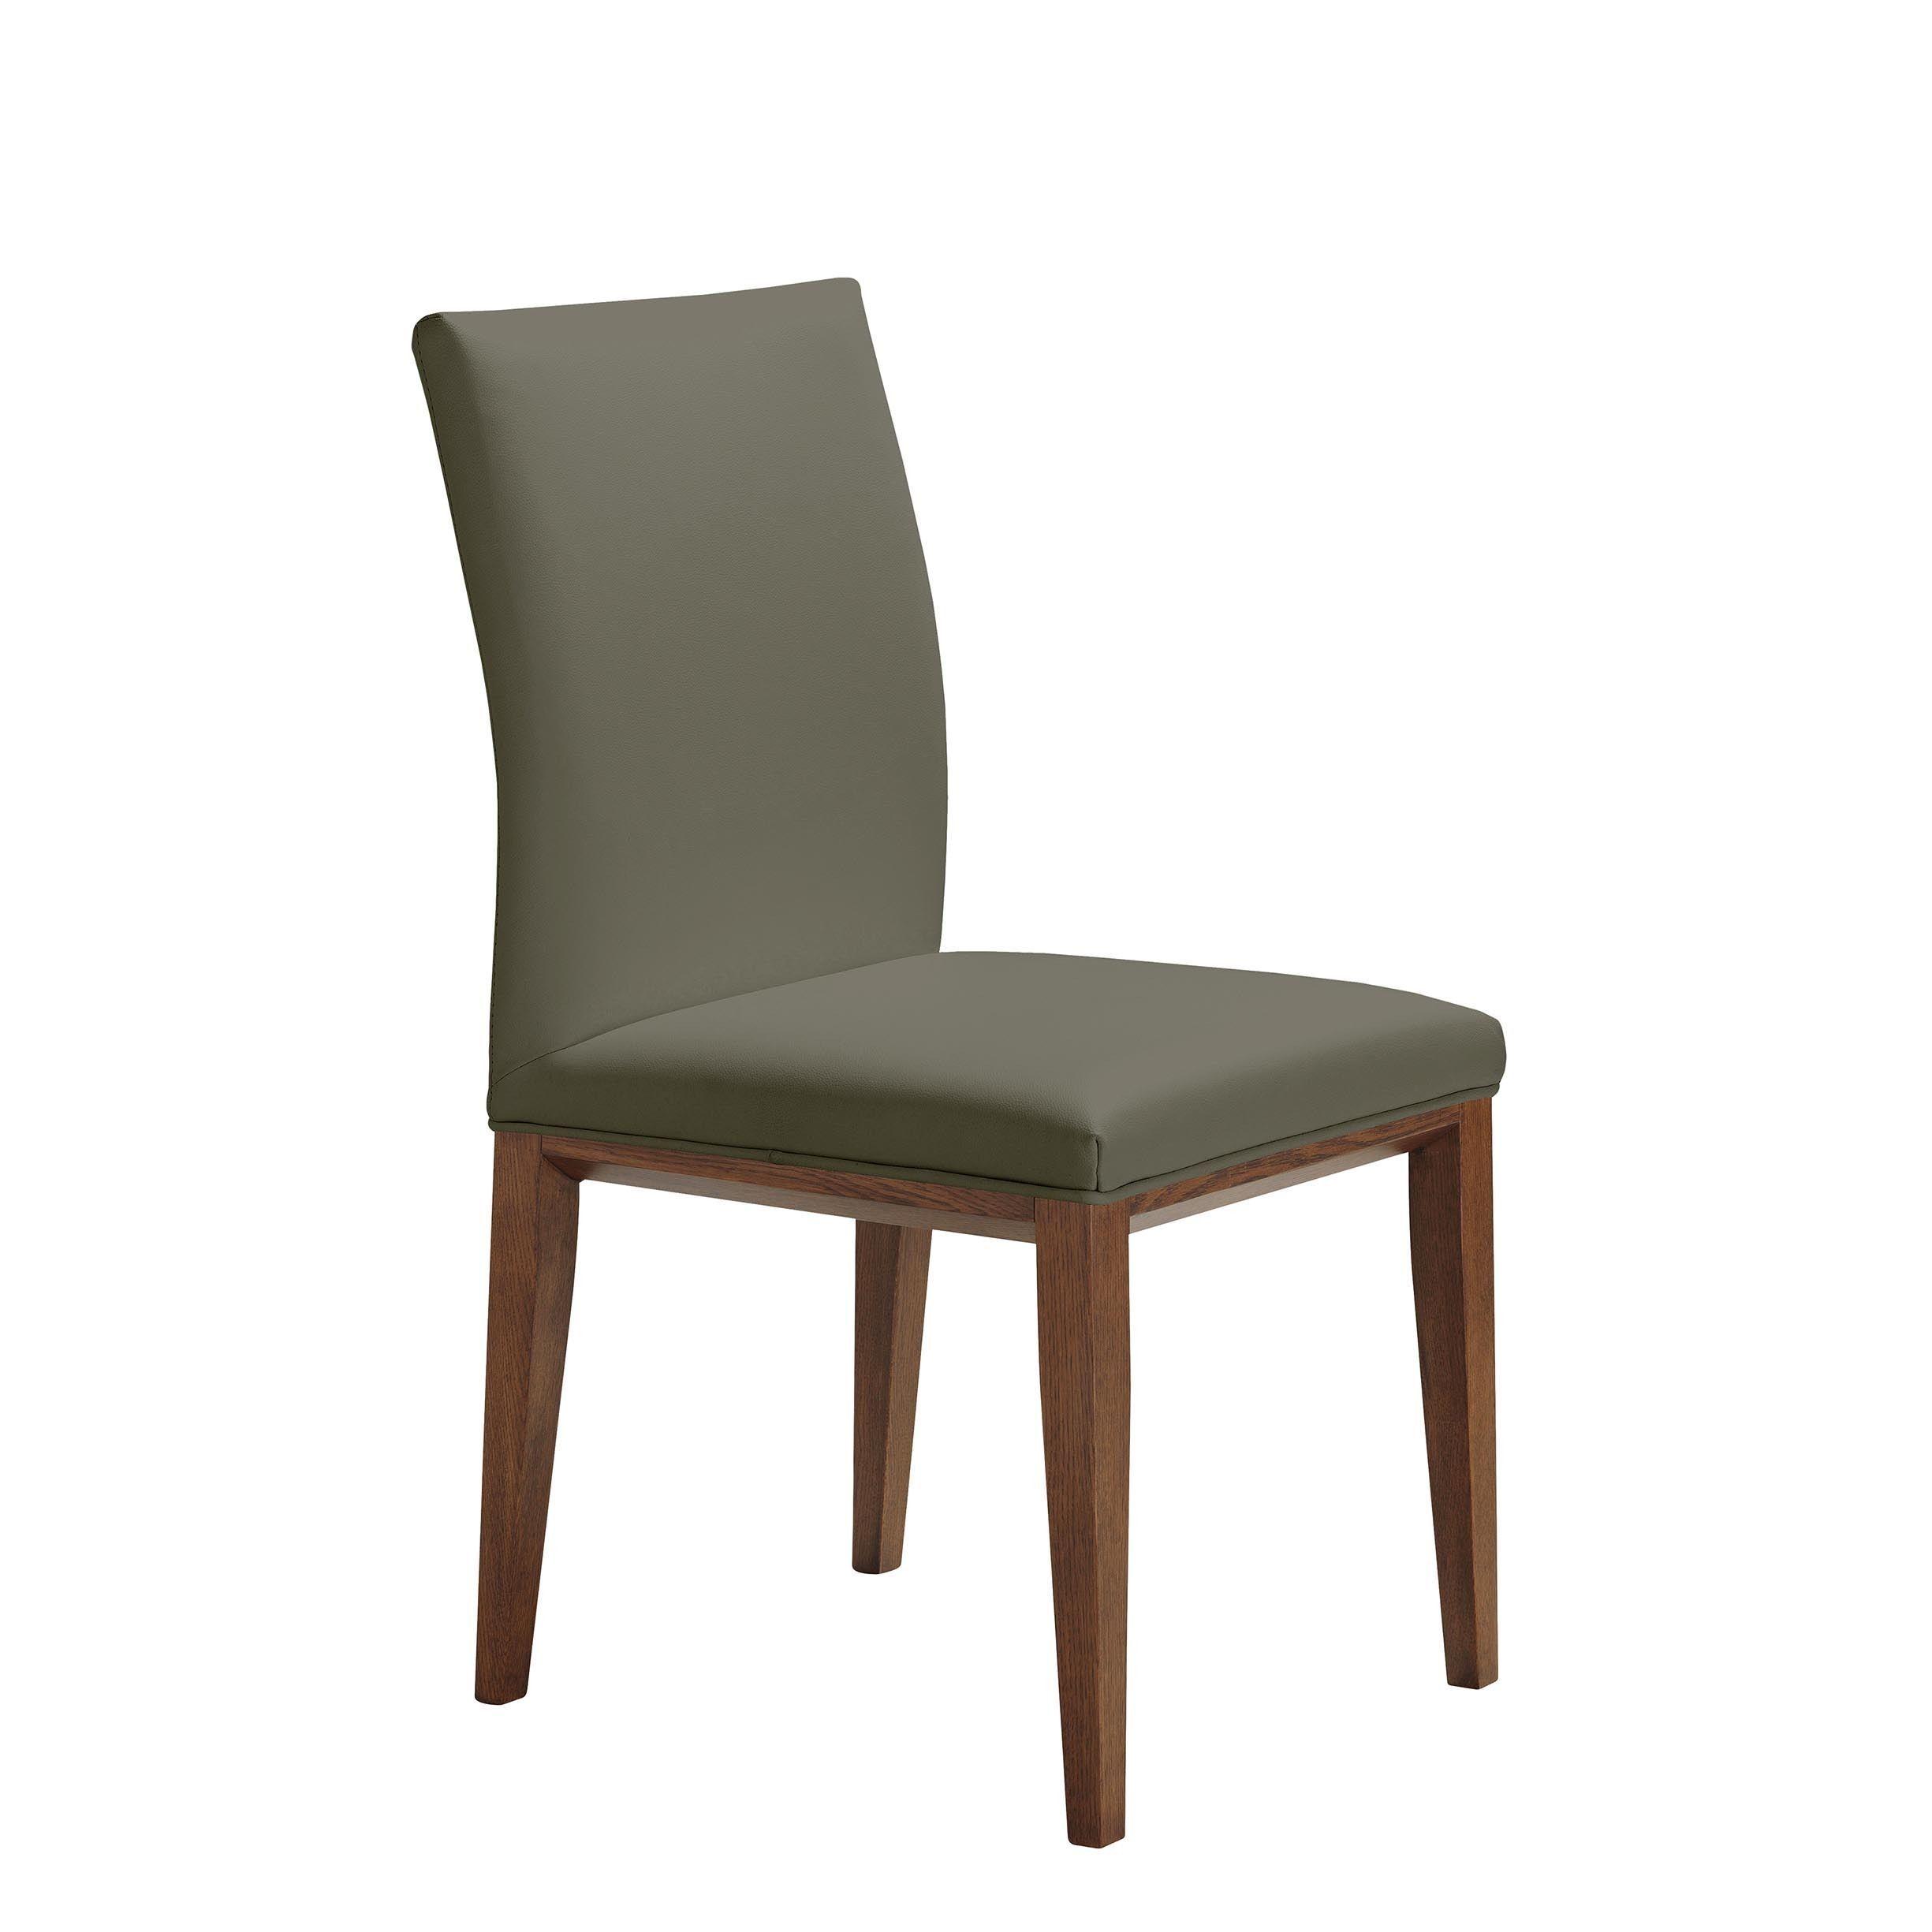 Aurelle home paris grey leather modern dining chair set of 2 grey leather dining chair set of 2